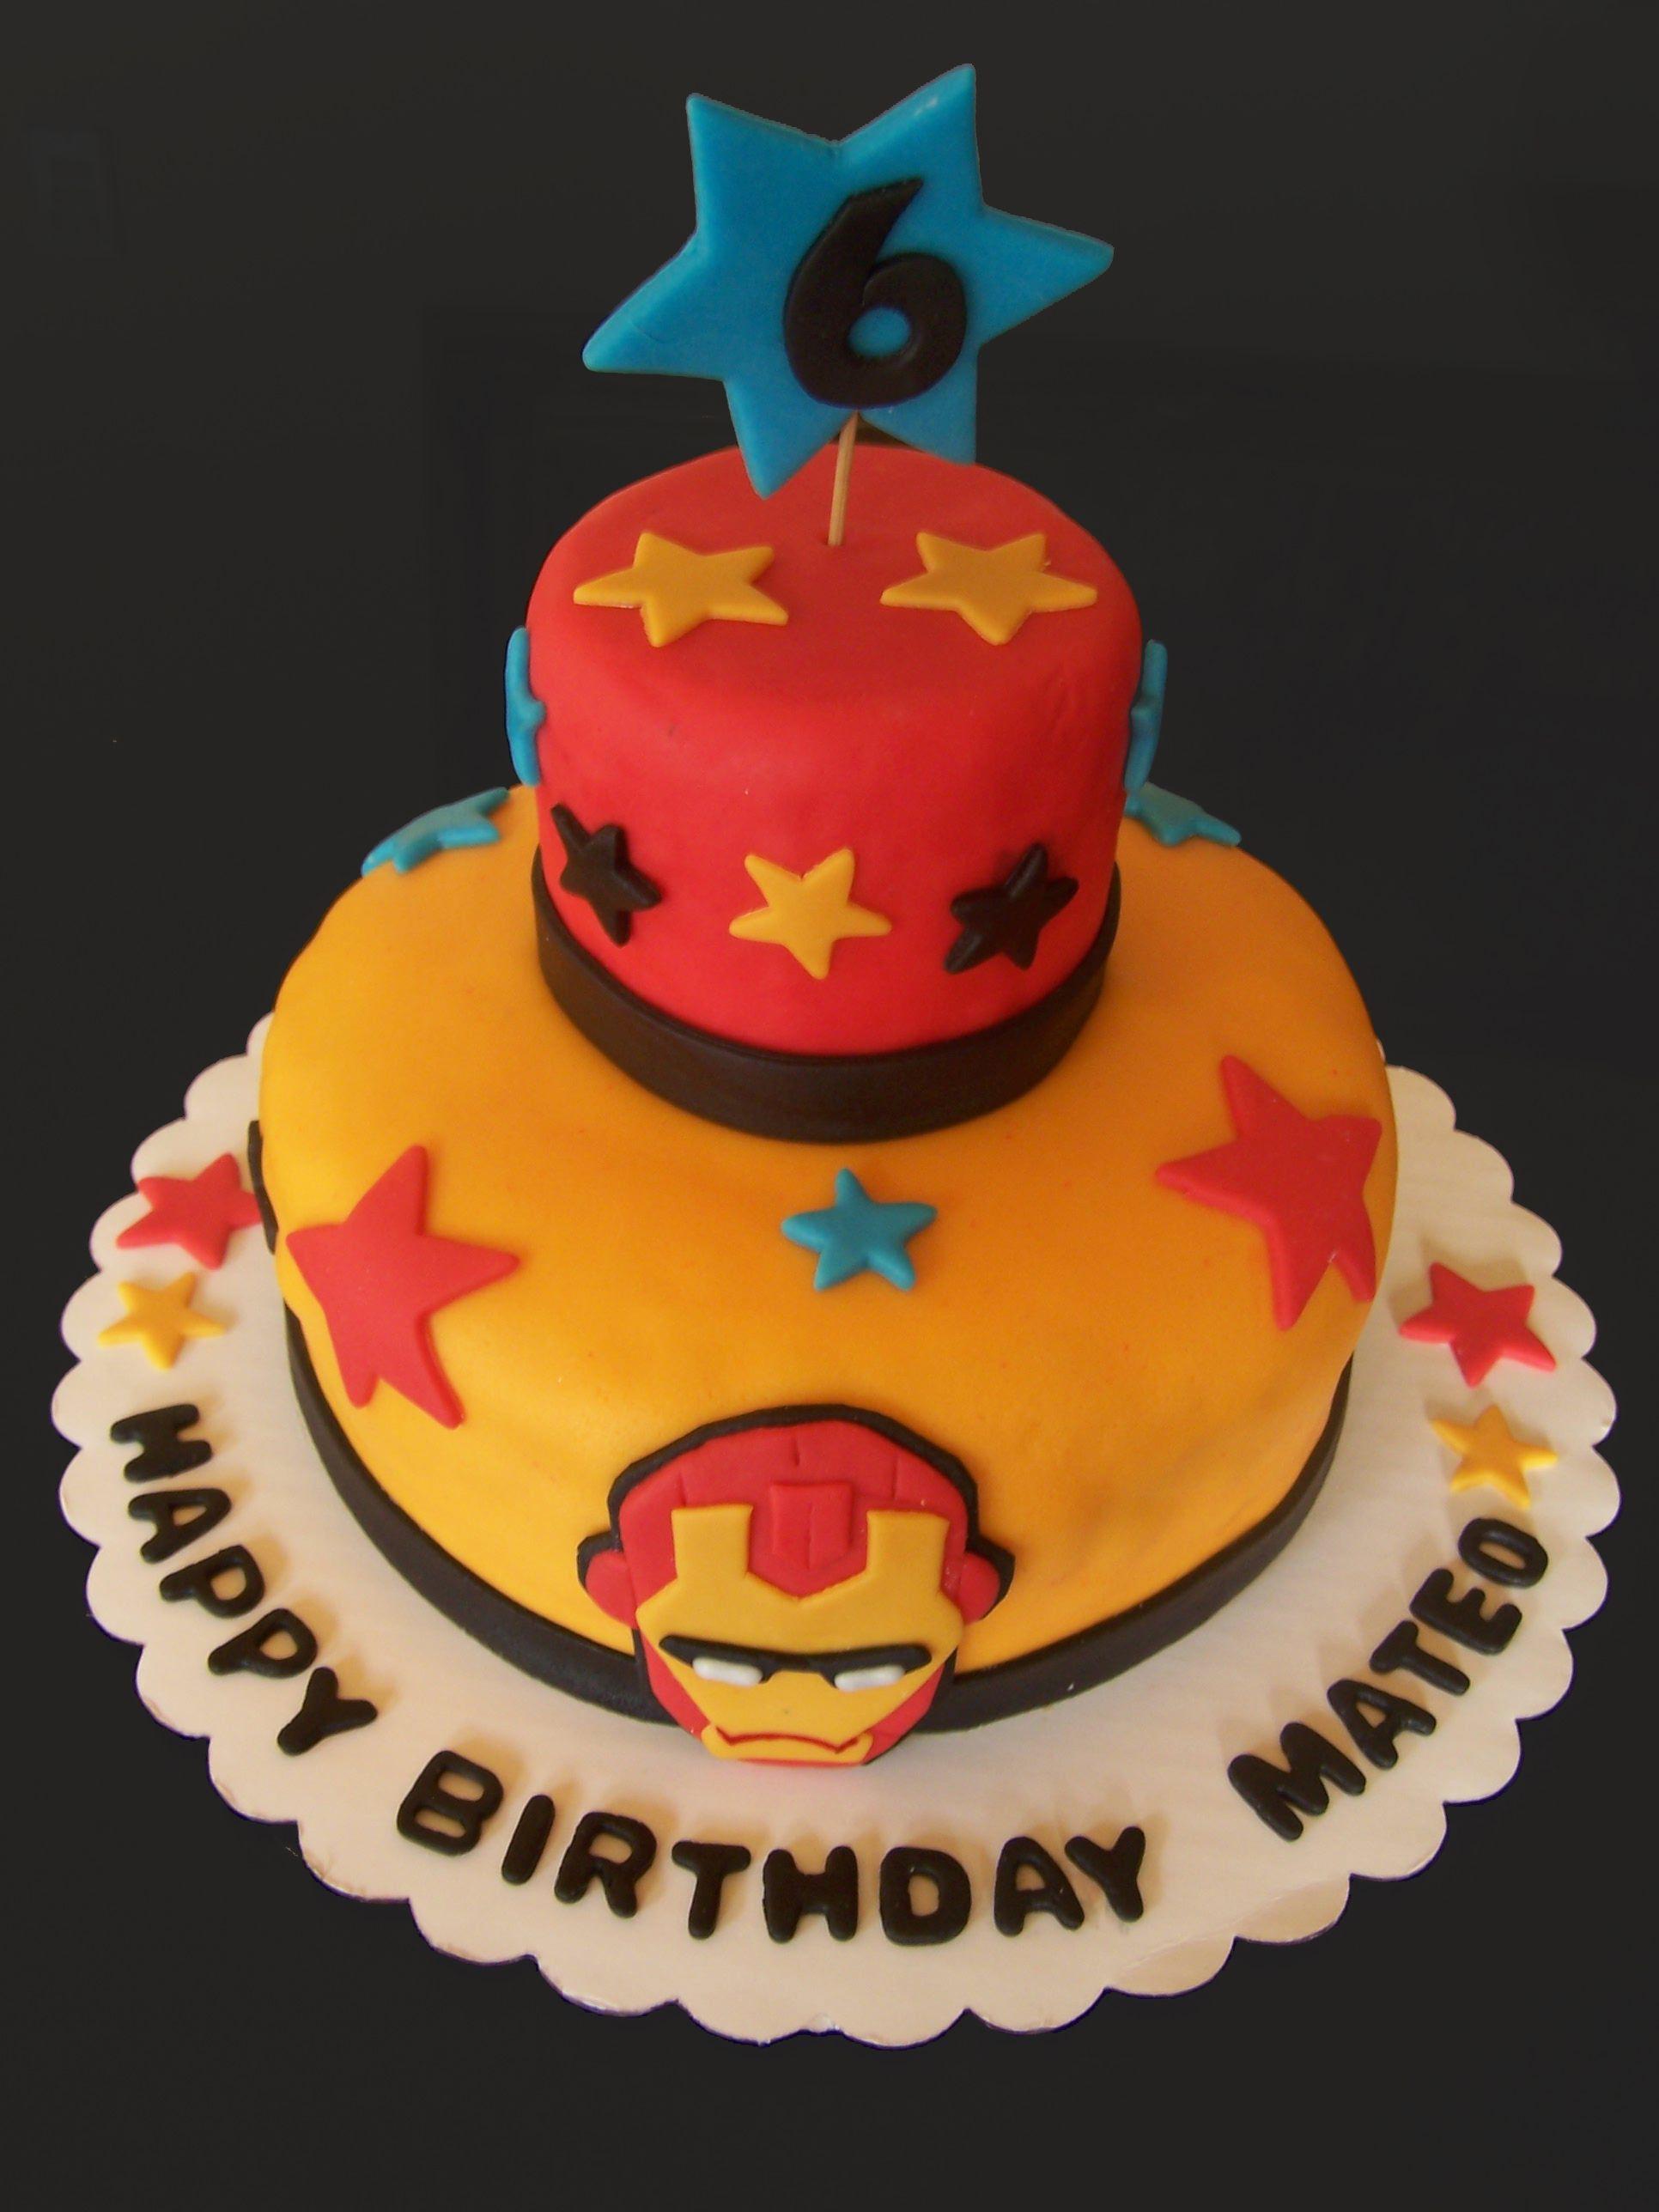 Iron Man Cake Cakes Pinterest Iron man cakes Man cake and Cake